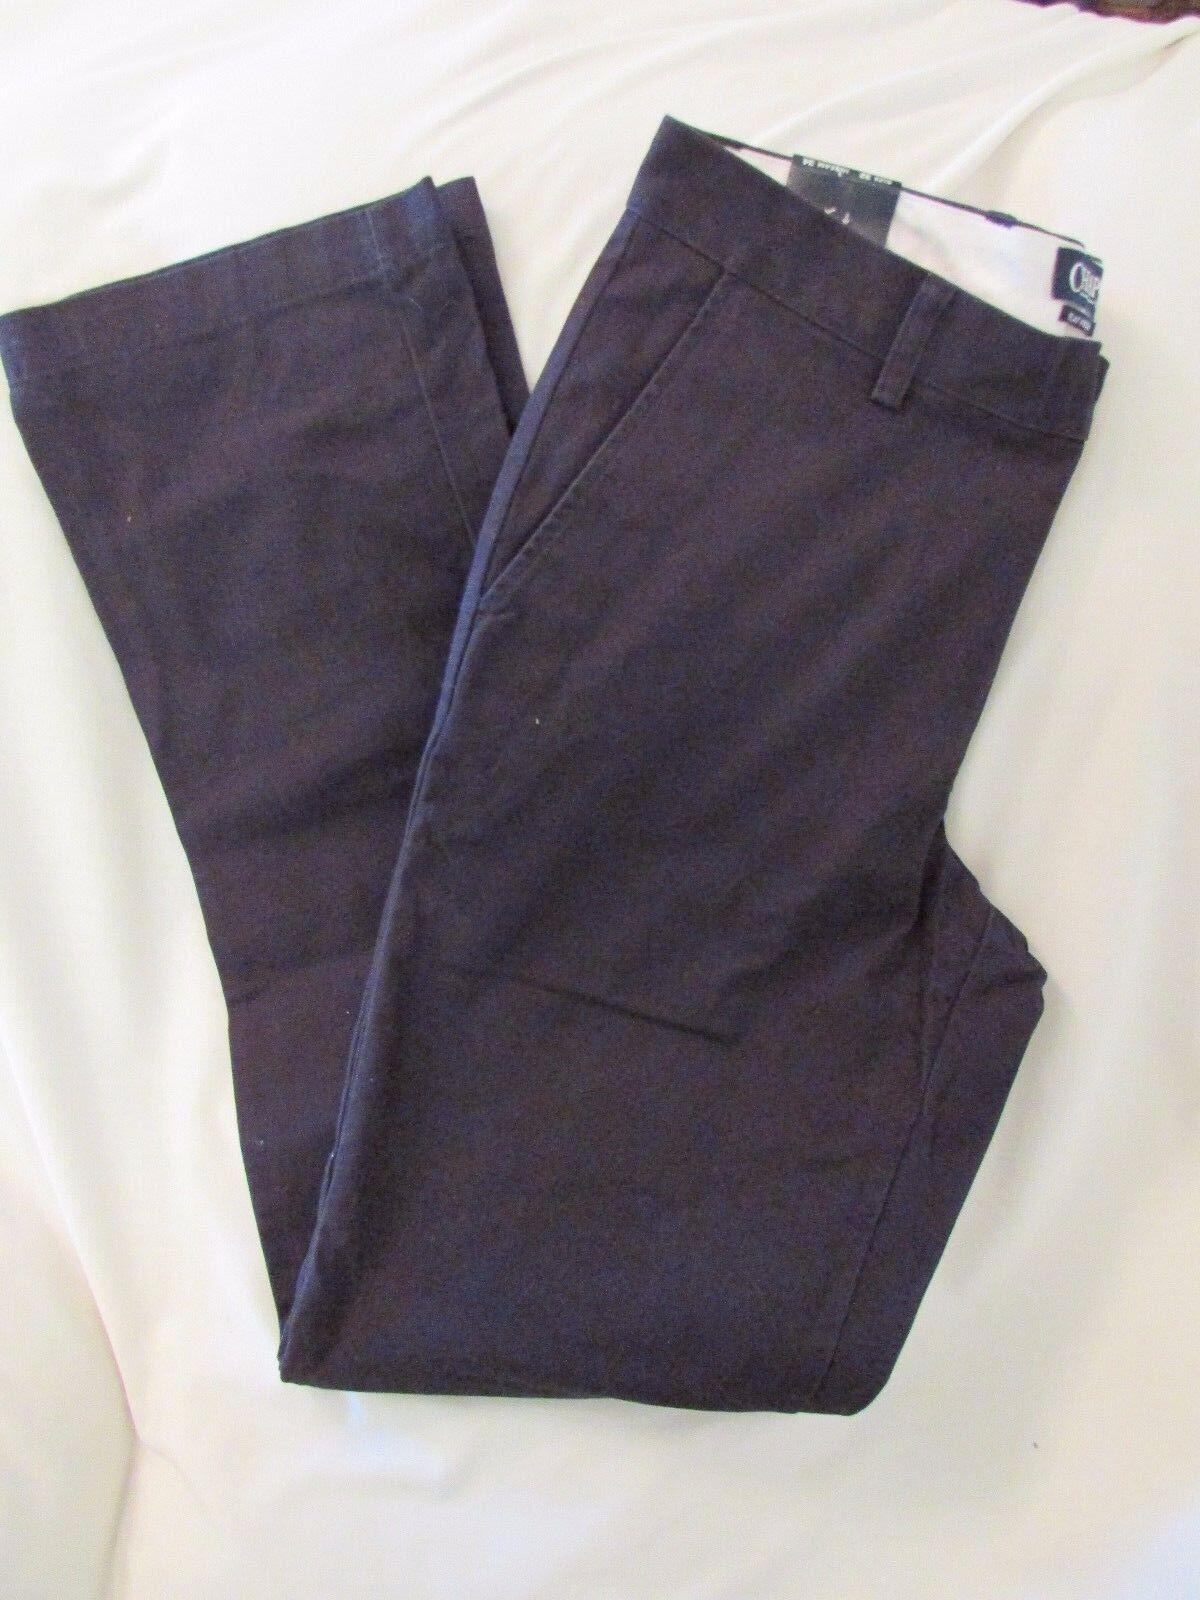 Men's  Chaps  Size 38x30, Navy, Classic, Straight, Flat Front, Pants